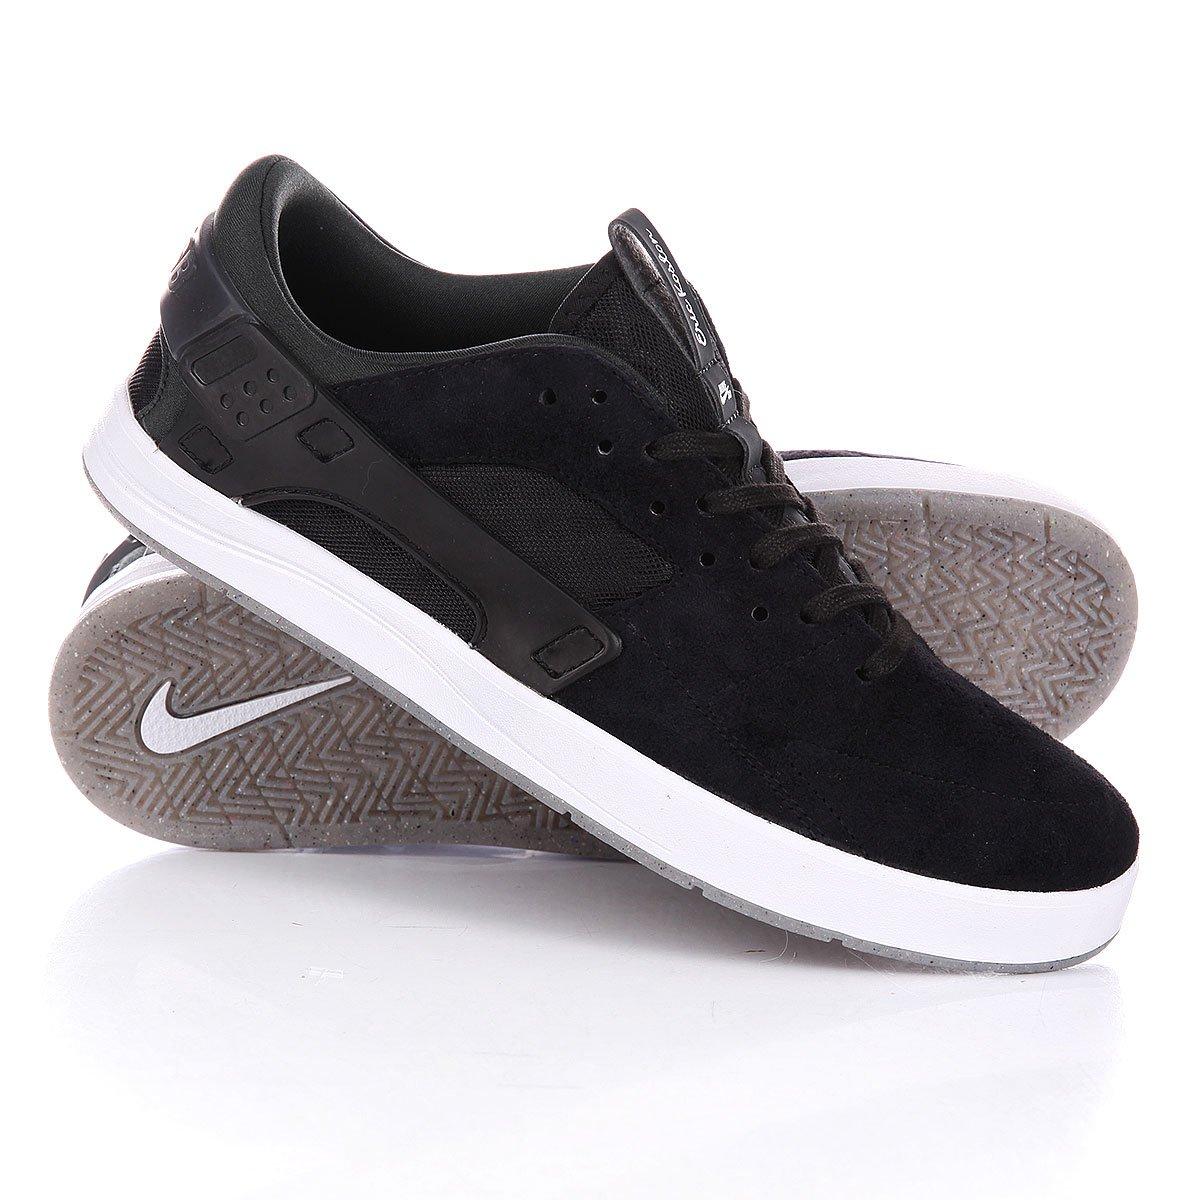 b92cef66 Купить кеды Nike Eric Koston Huarache Black/Anthracite/White (705192-001) в  интернет-магазине Proskater.kz